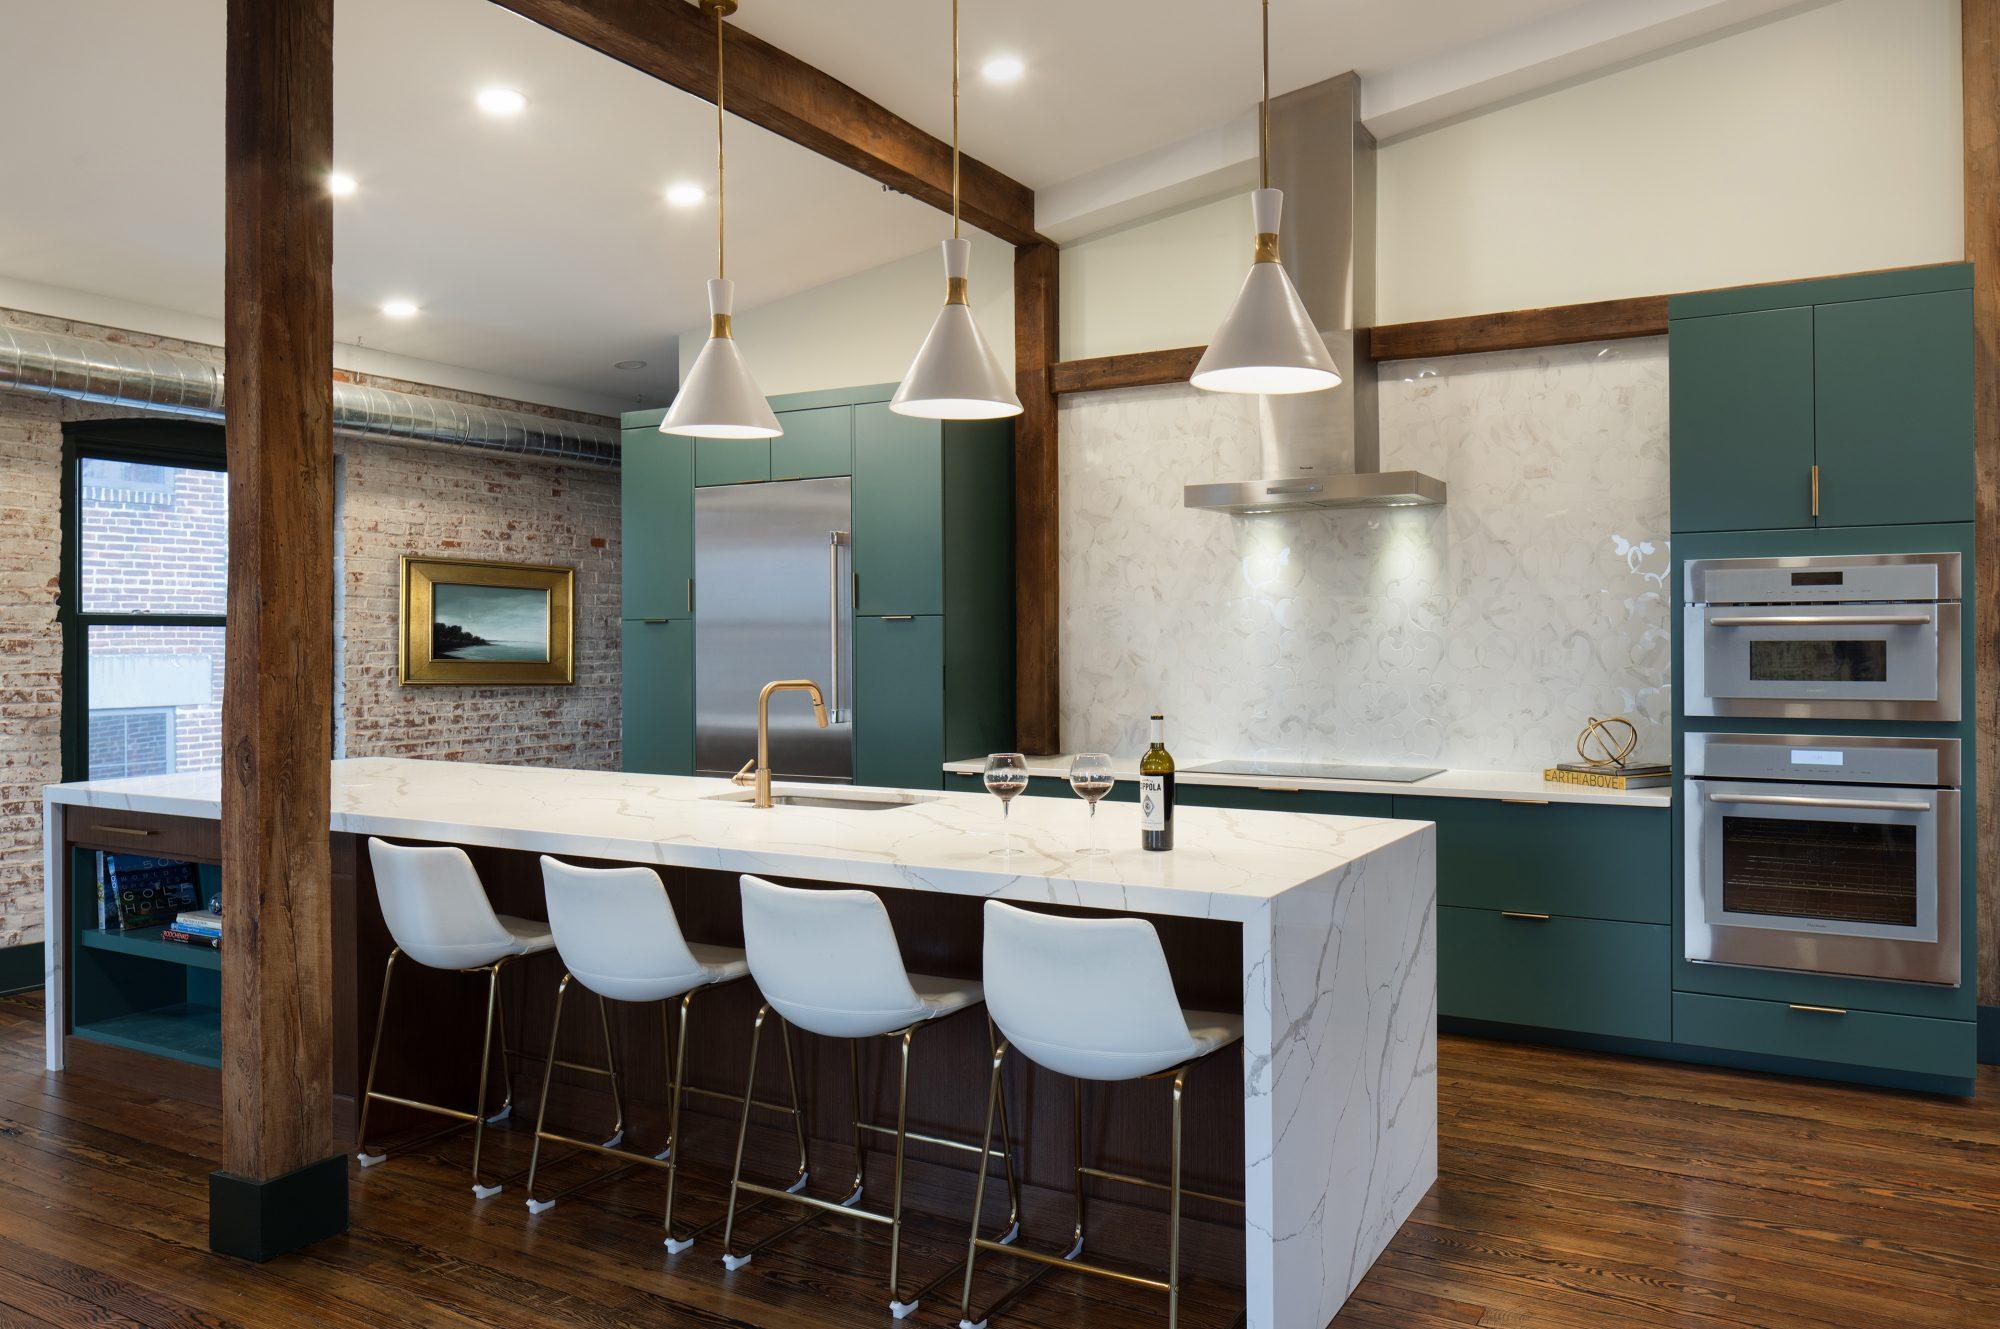 Kitchen Dining Room Design Remodeling In Philadelphia Lancaster Pa Henrietta Heisler Interiors Inc